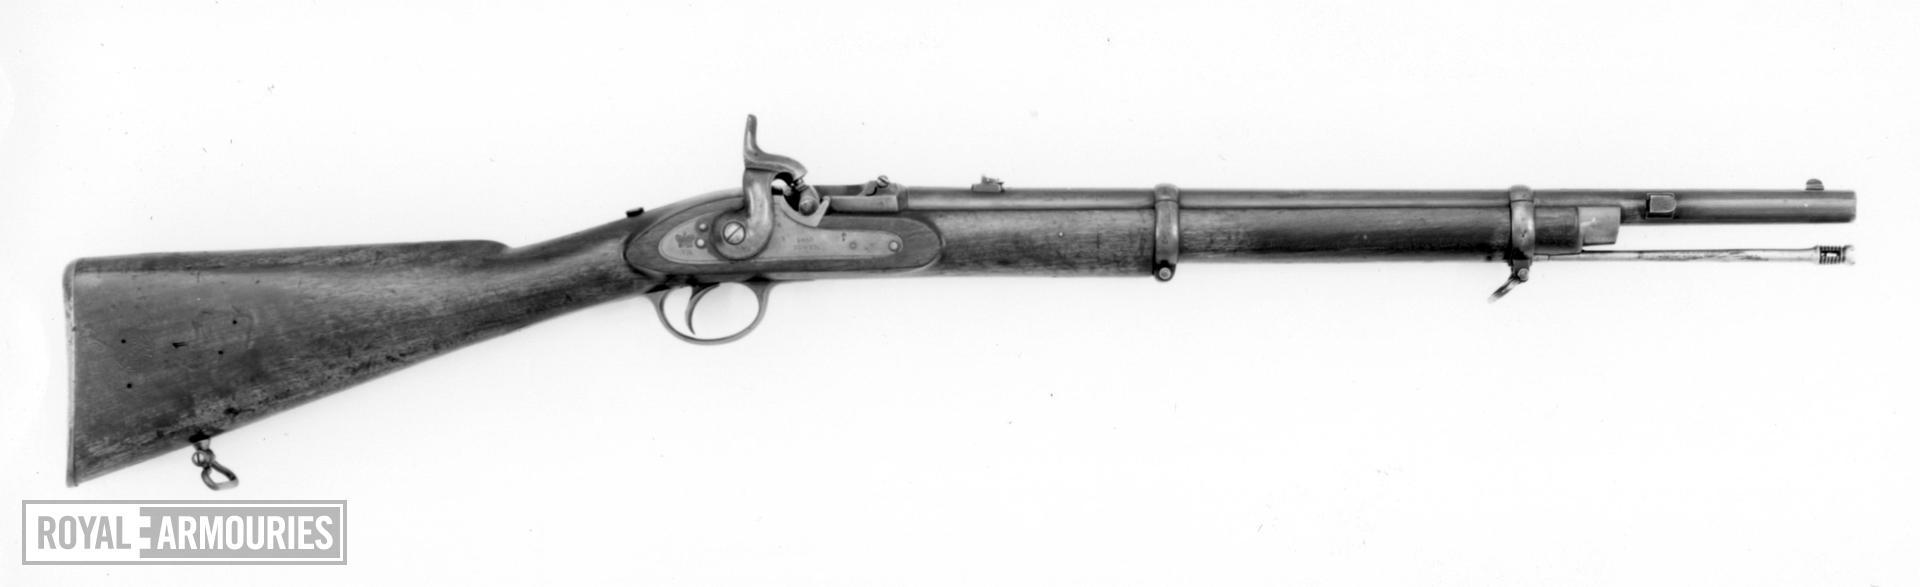 Percussion breech-loading military carbine - By F. A. Braendlin